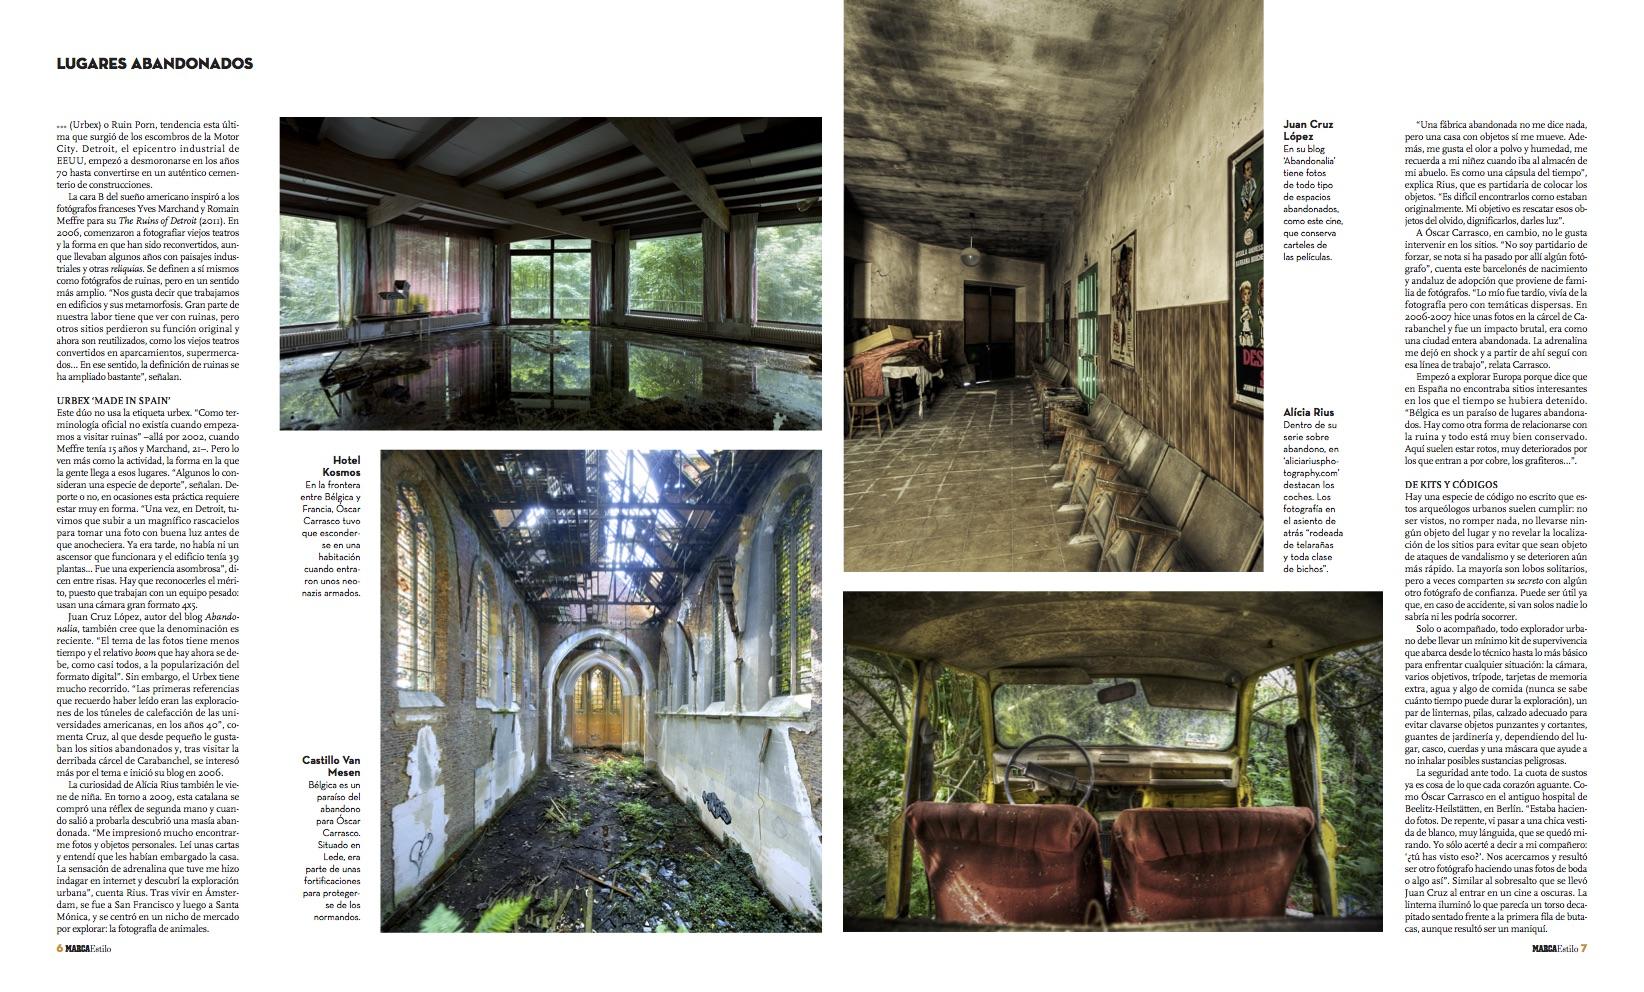 lugares-abandonados-urbex-exploration-alicia-rius.jpg